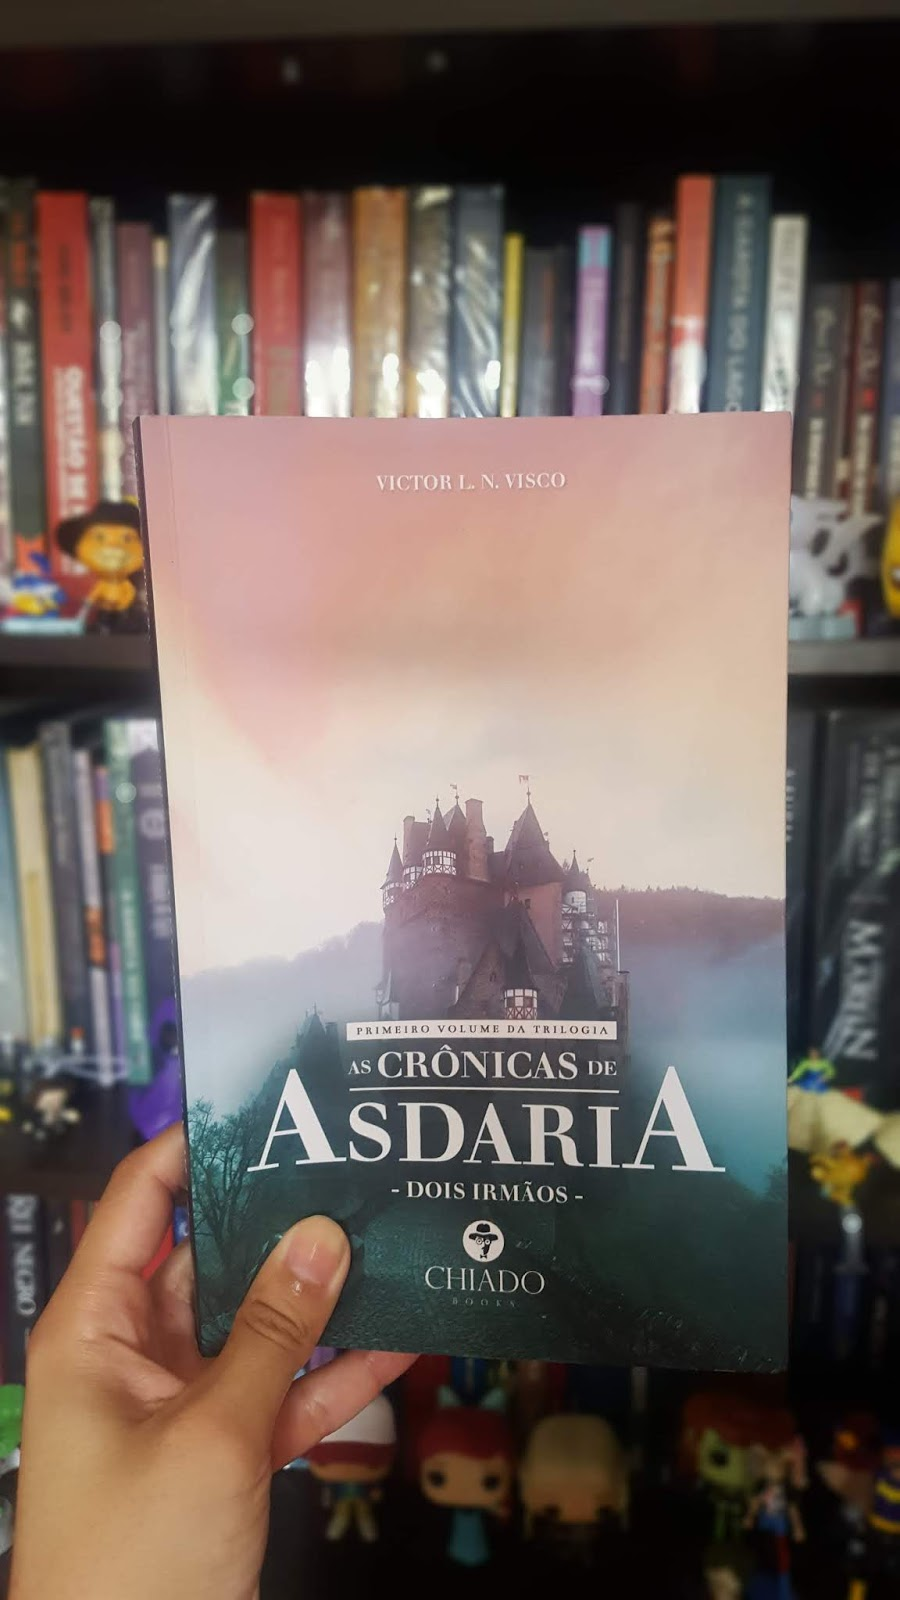 As crônicas de Asdaria